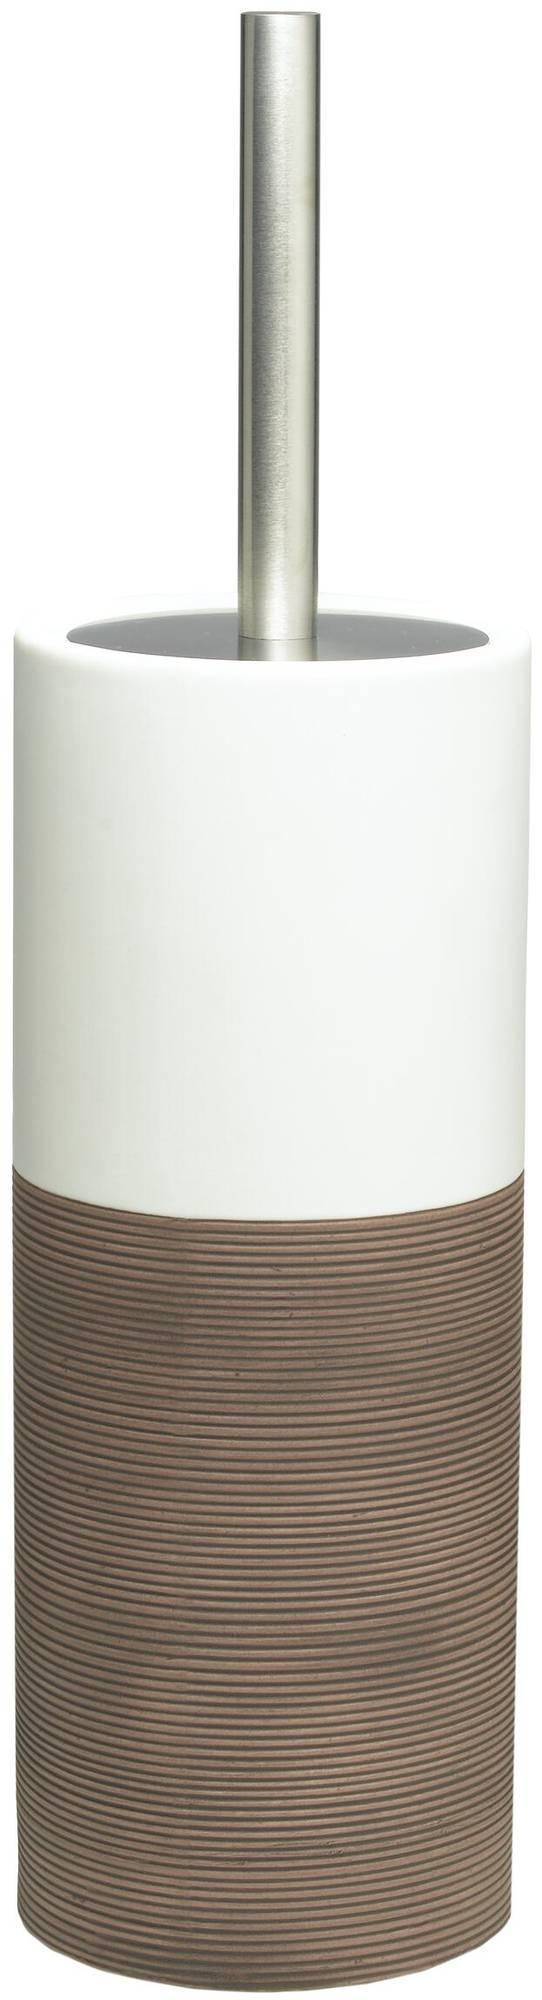 Sealskin Doppio+ Toiletborstelhouder Bruin